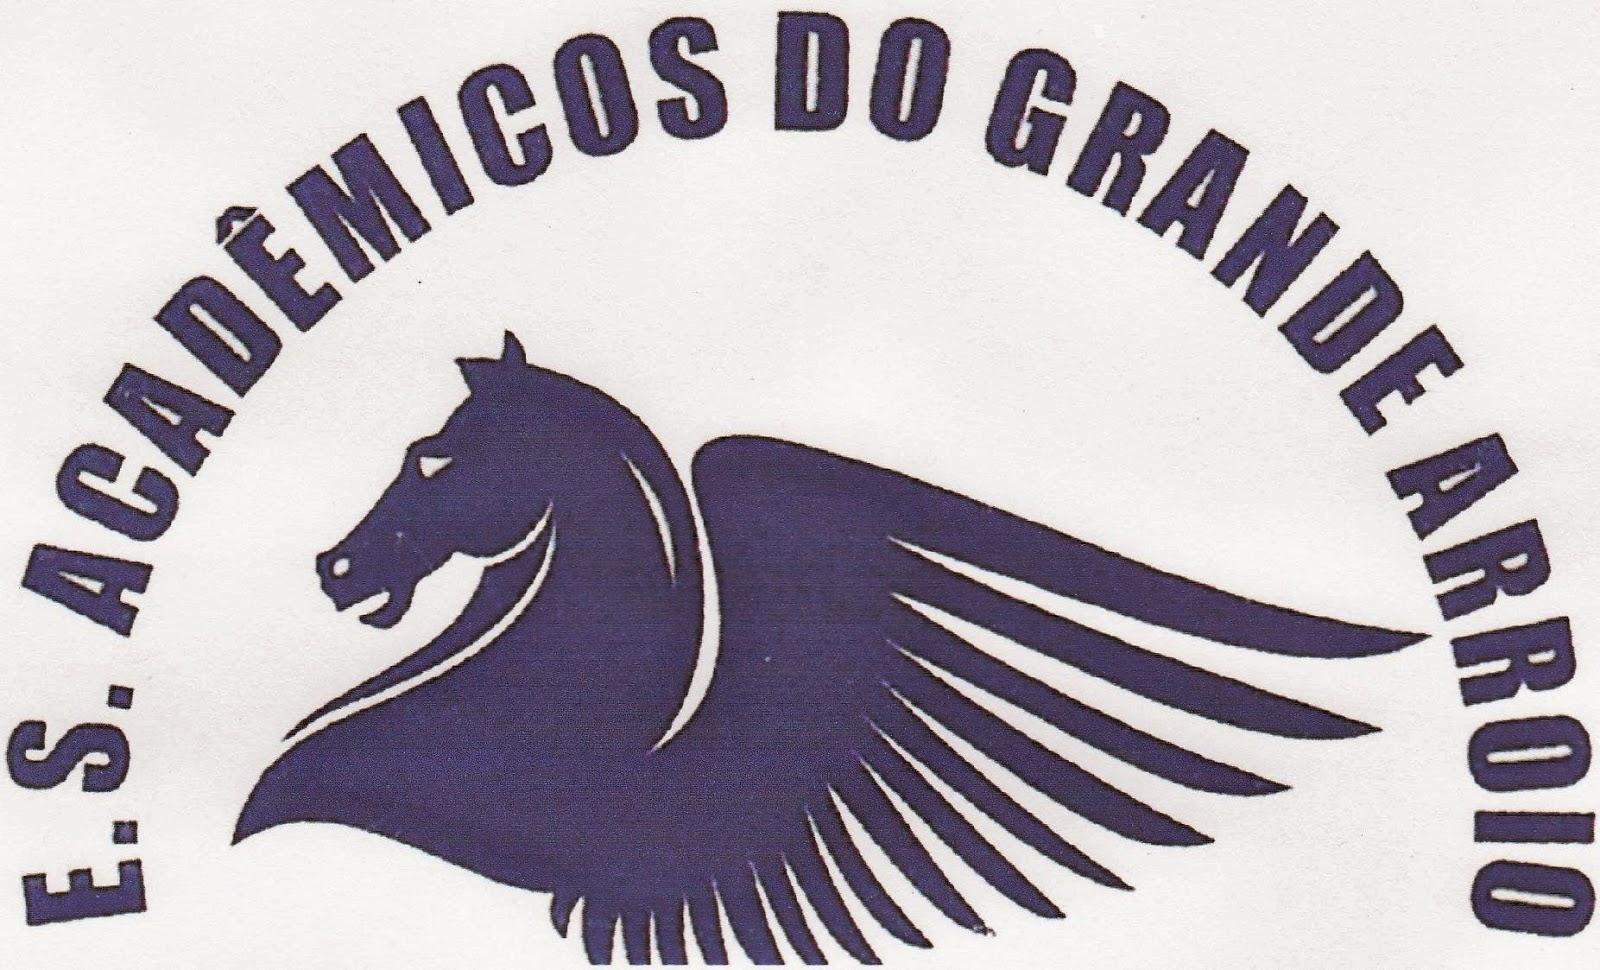 http://2.bp.blogspot.com/-K-rCDqS6T30/UzgcxEfOvmI/AAAAAAAACPE/xG3FjAbG2Ds/s1600/ESCOLA+DE+SAMBA+ACAD%C3%8AMICOS+DO+GRANDE+ARROIO.jpg